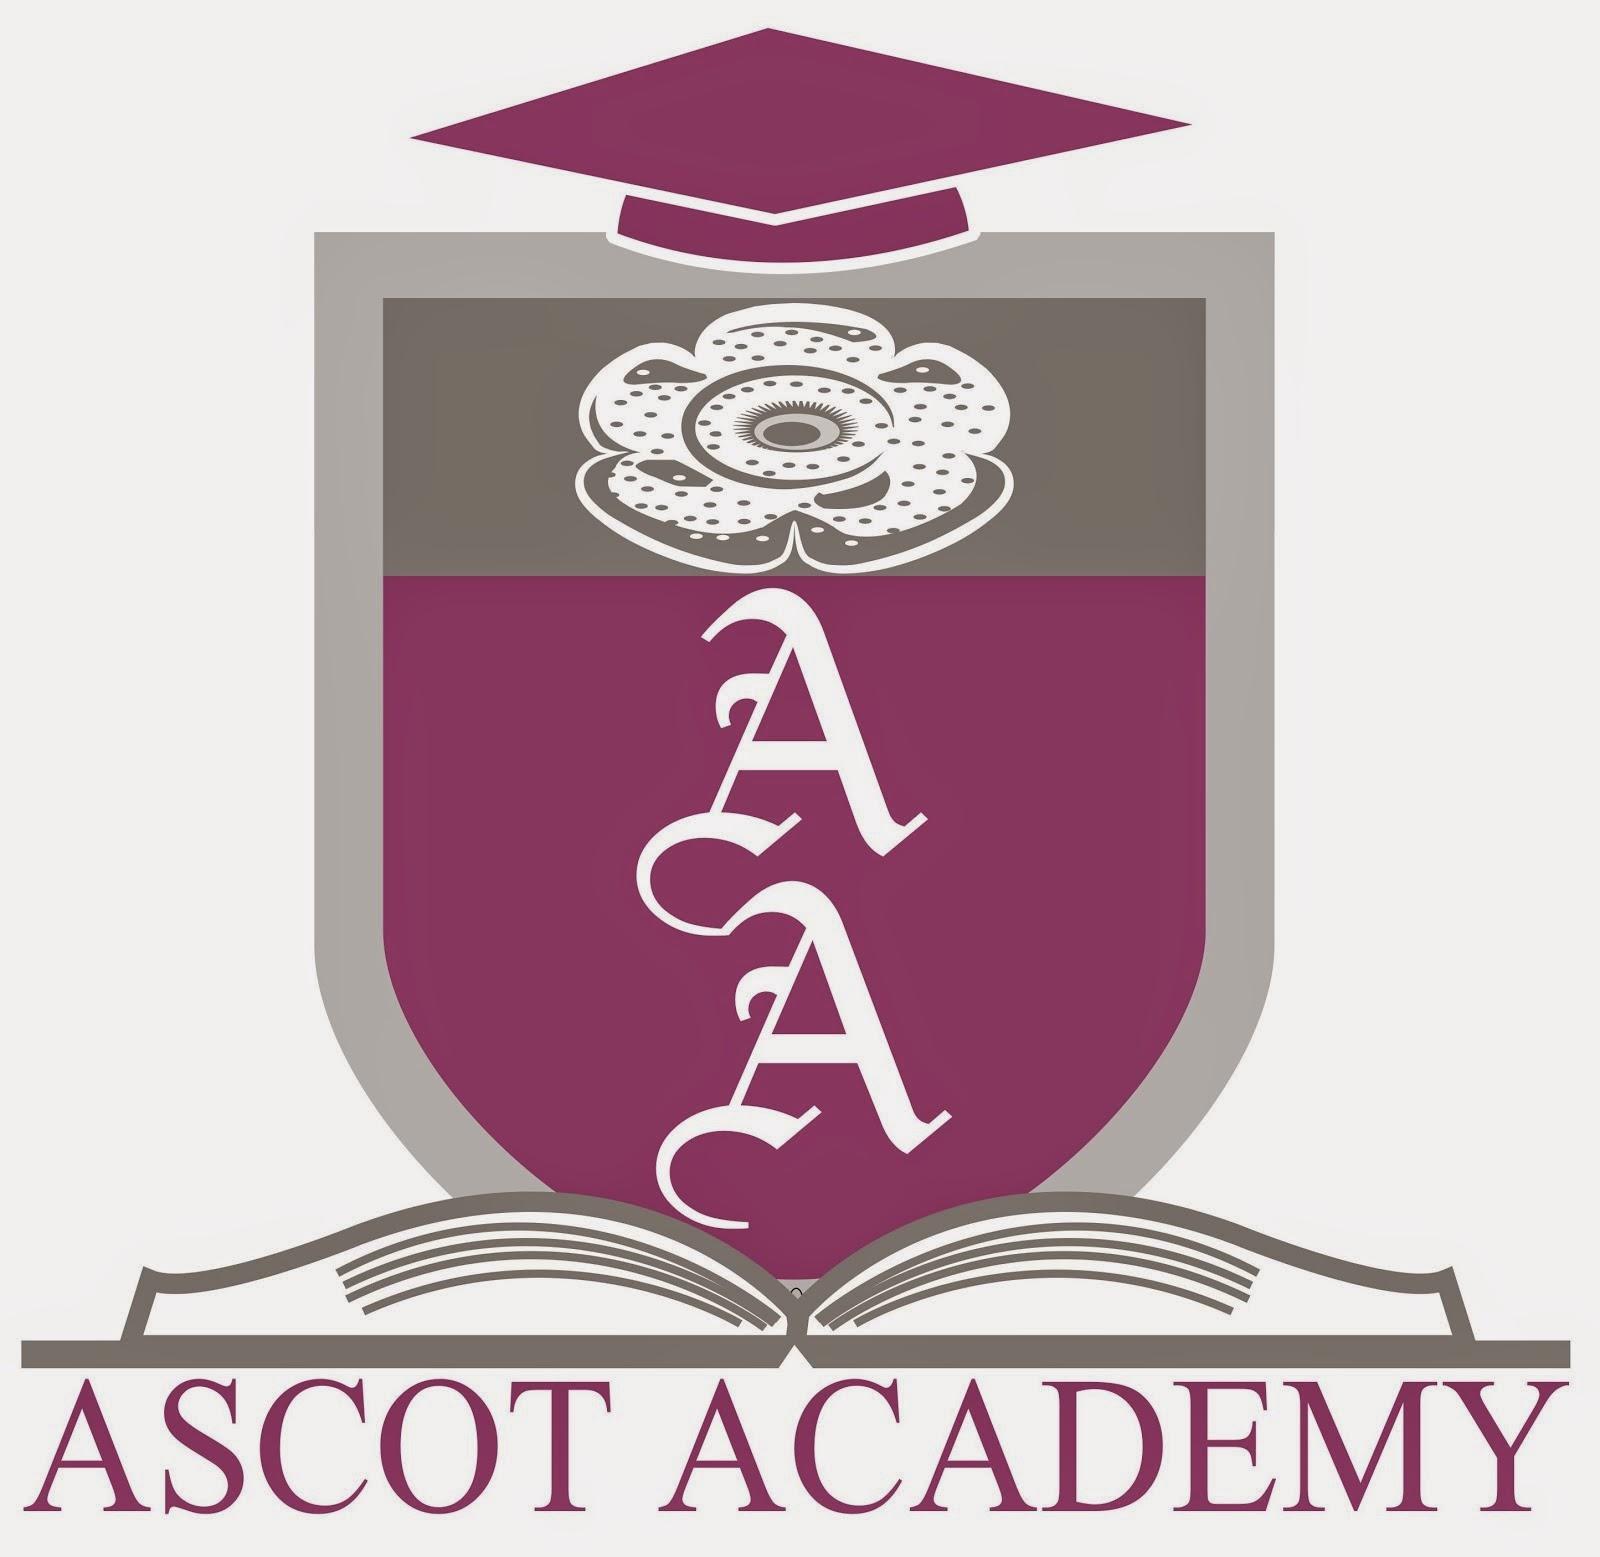 Ascot Academy